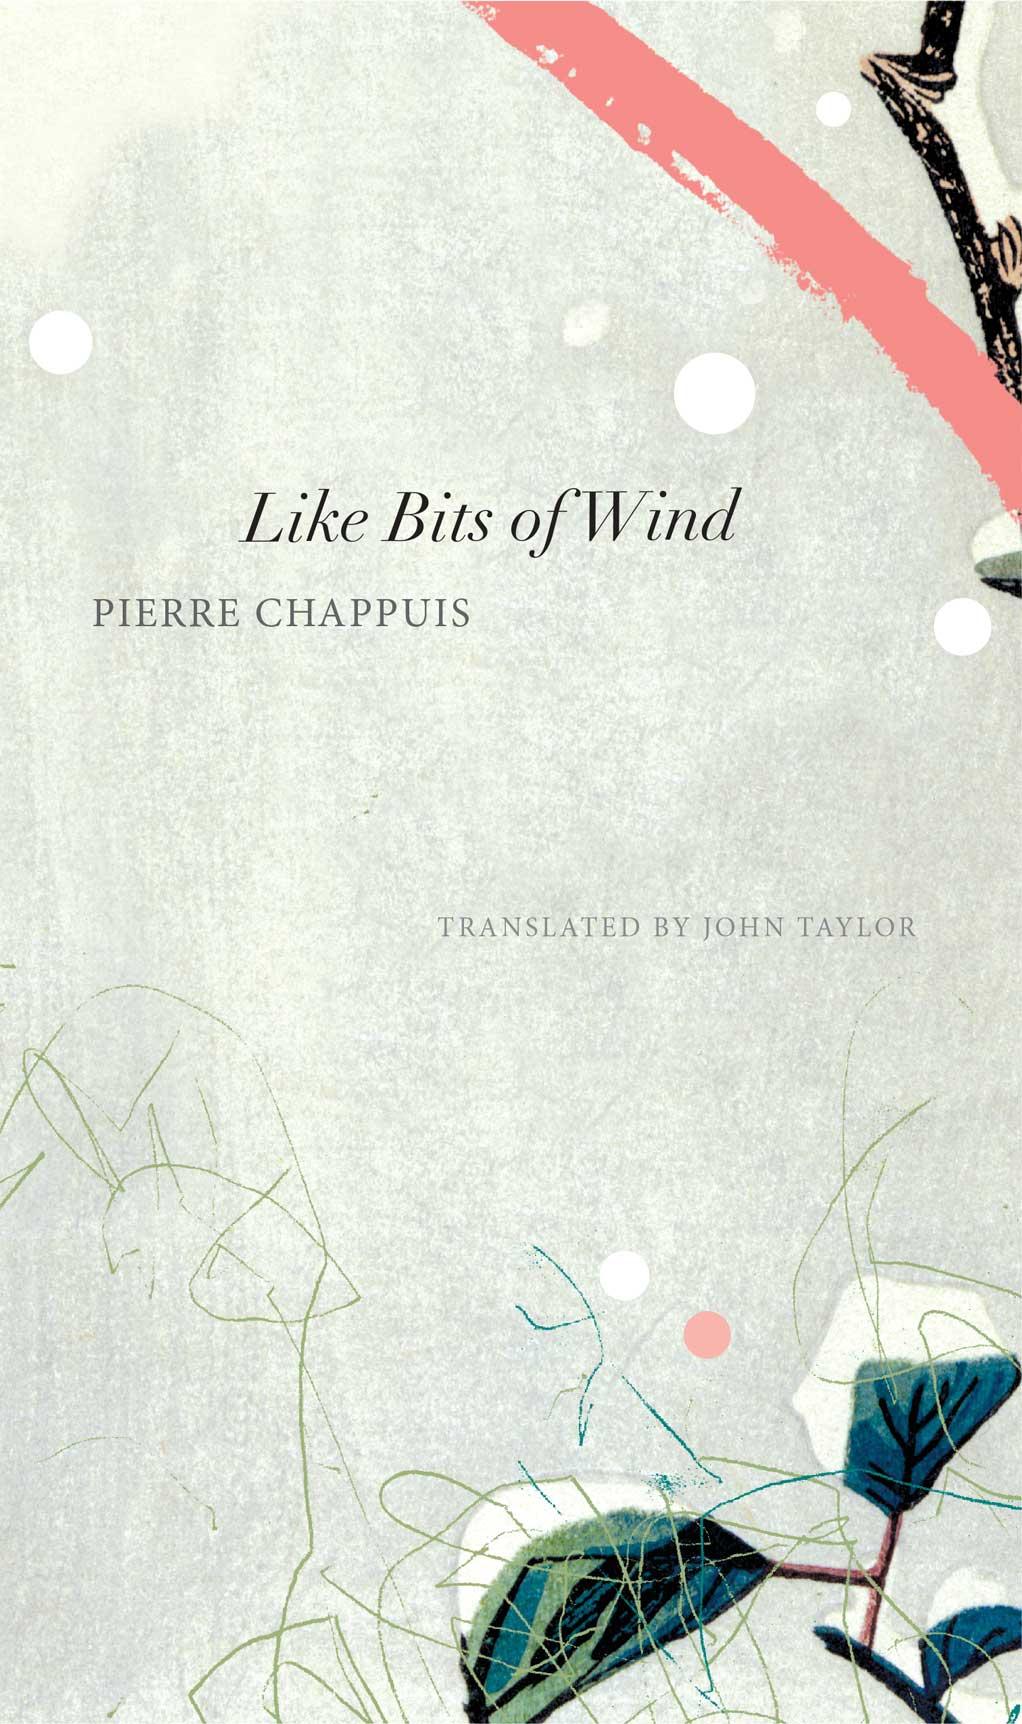 Like Bits of Wind